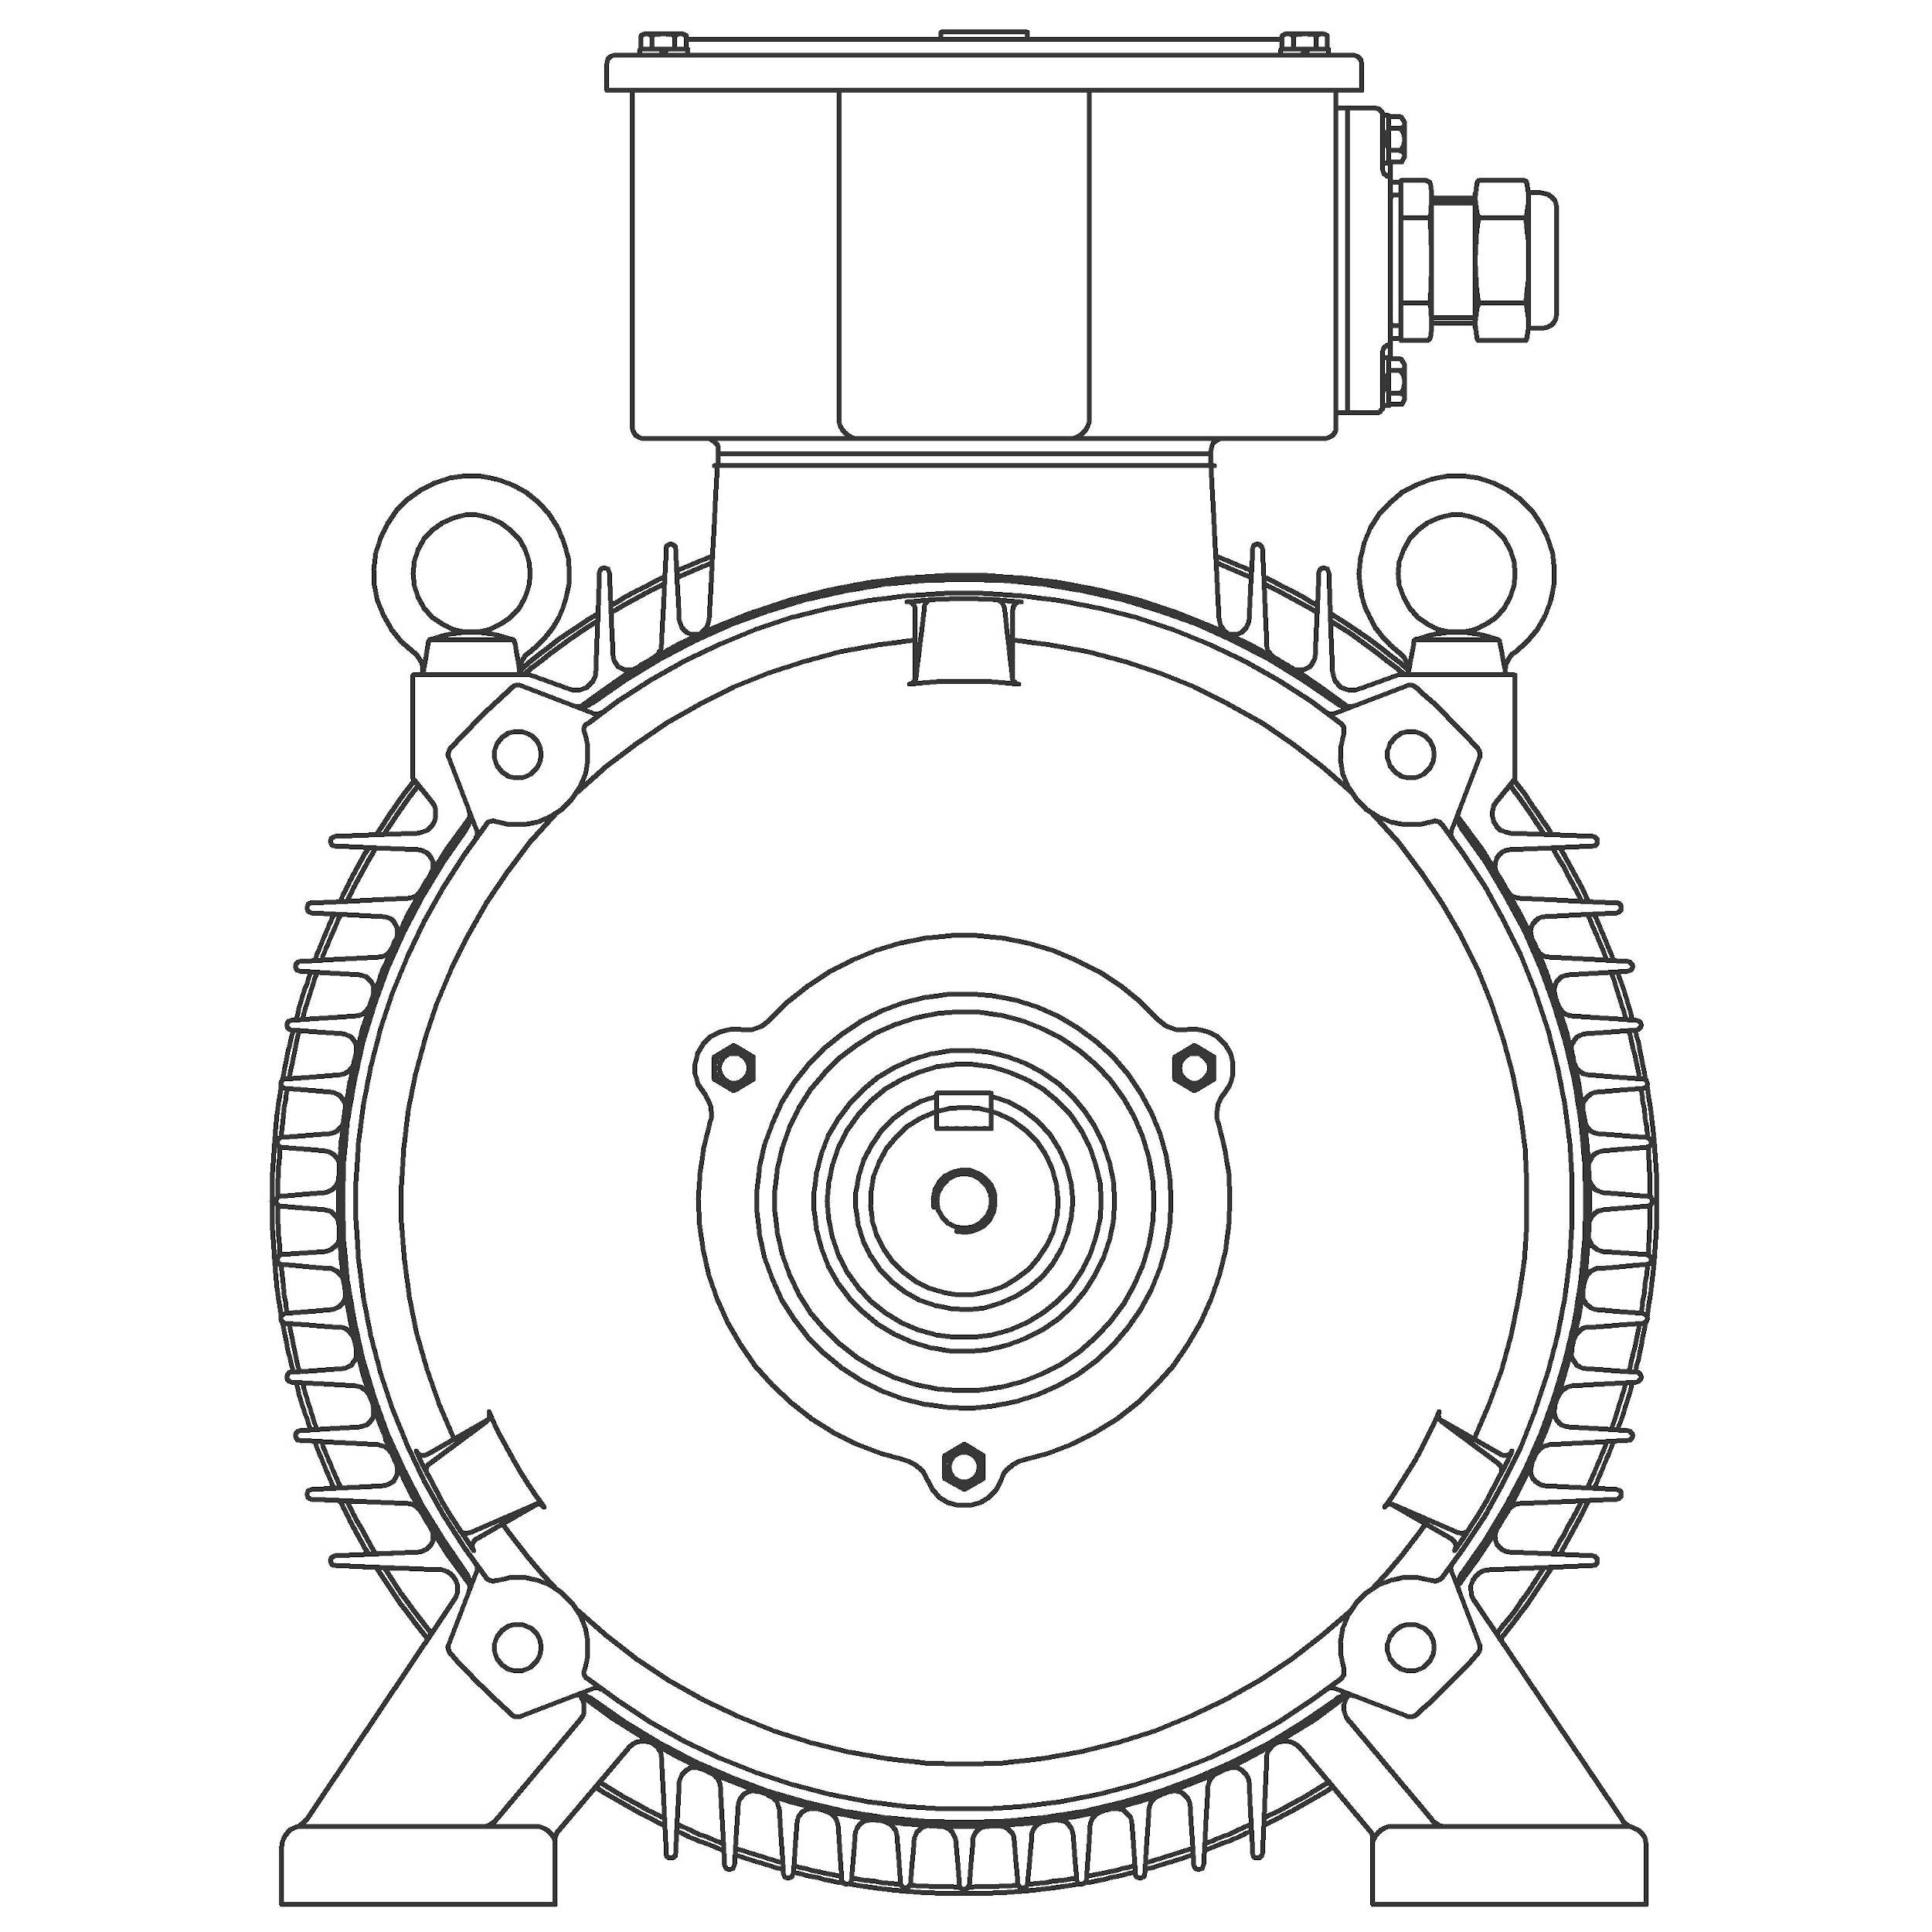 MP0254 Teco-Westinghouse 25HP/18.5kW MAX-IE3 IEC Metric